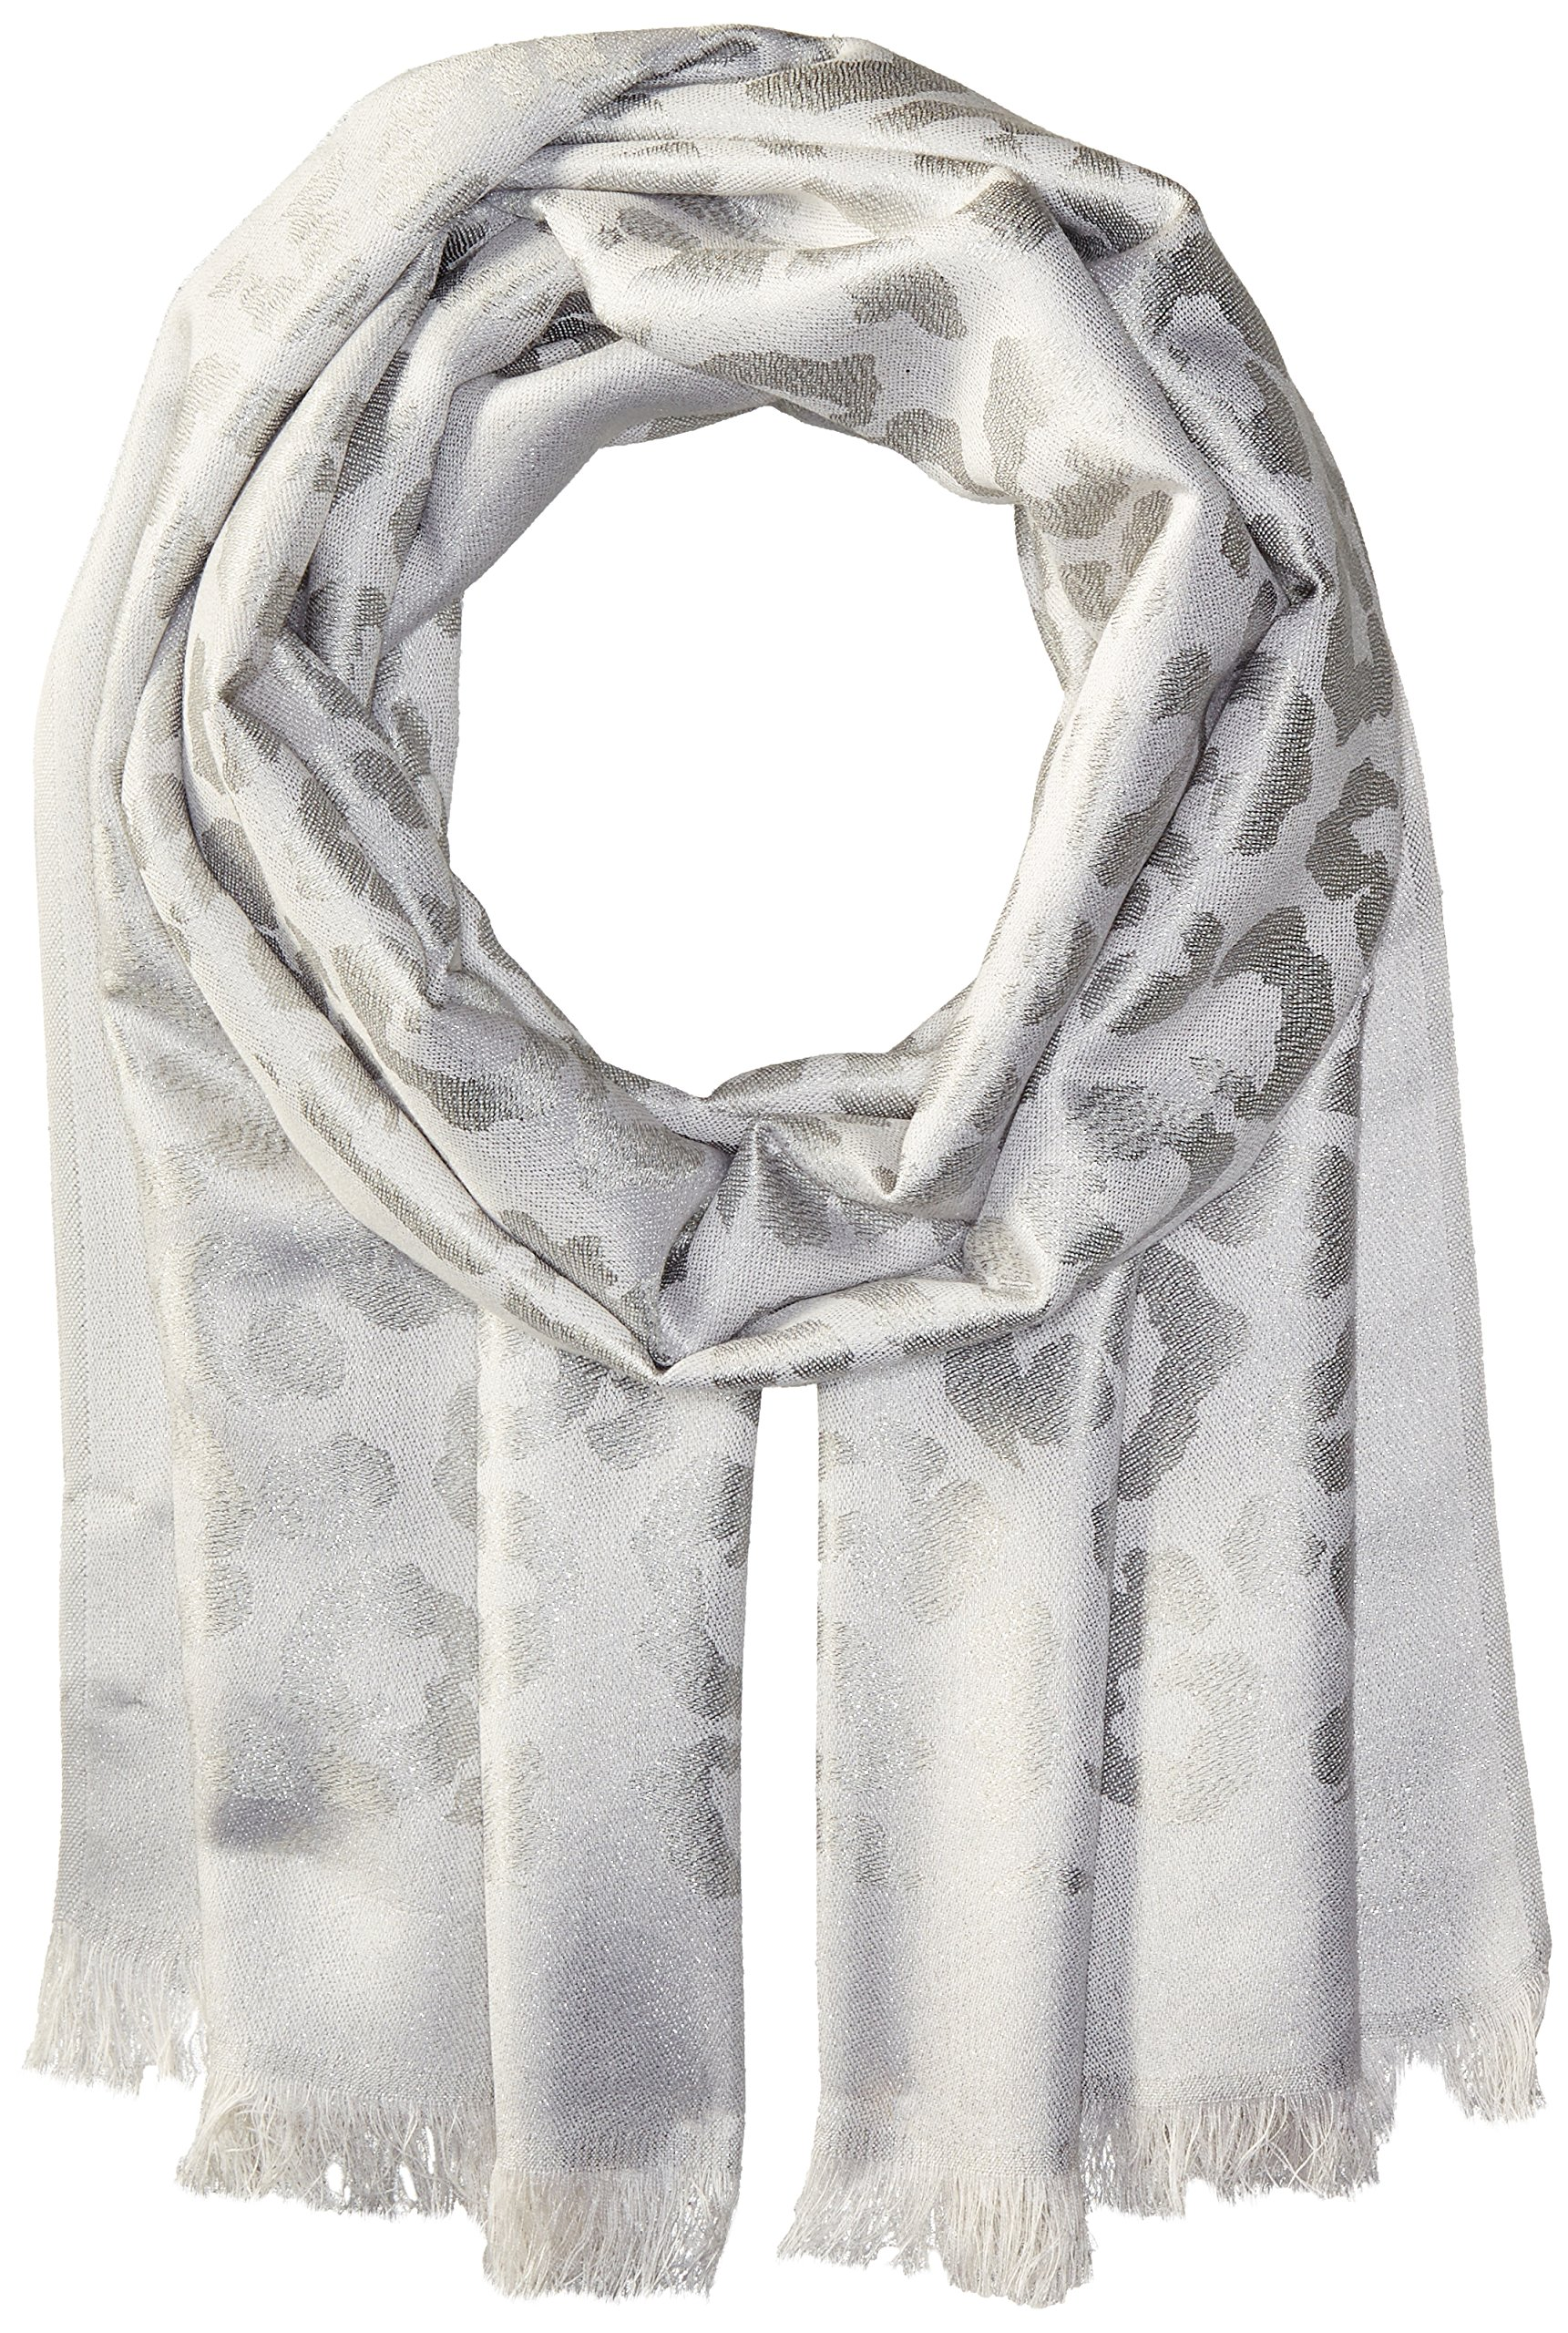 Badgley Mischka Women's Ocelot Lurex Jacquard Wrap Scarf, ivory/silver, One Size